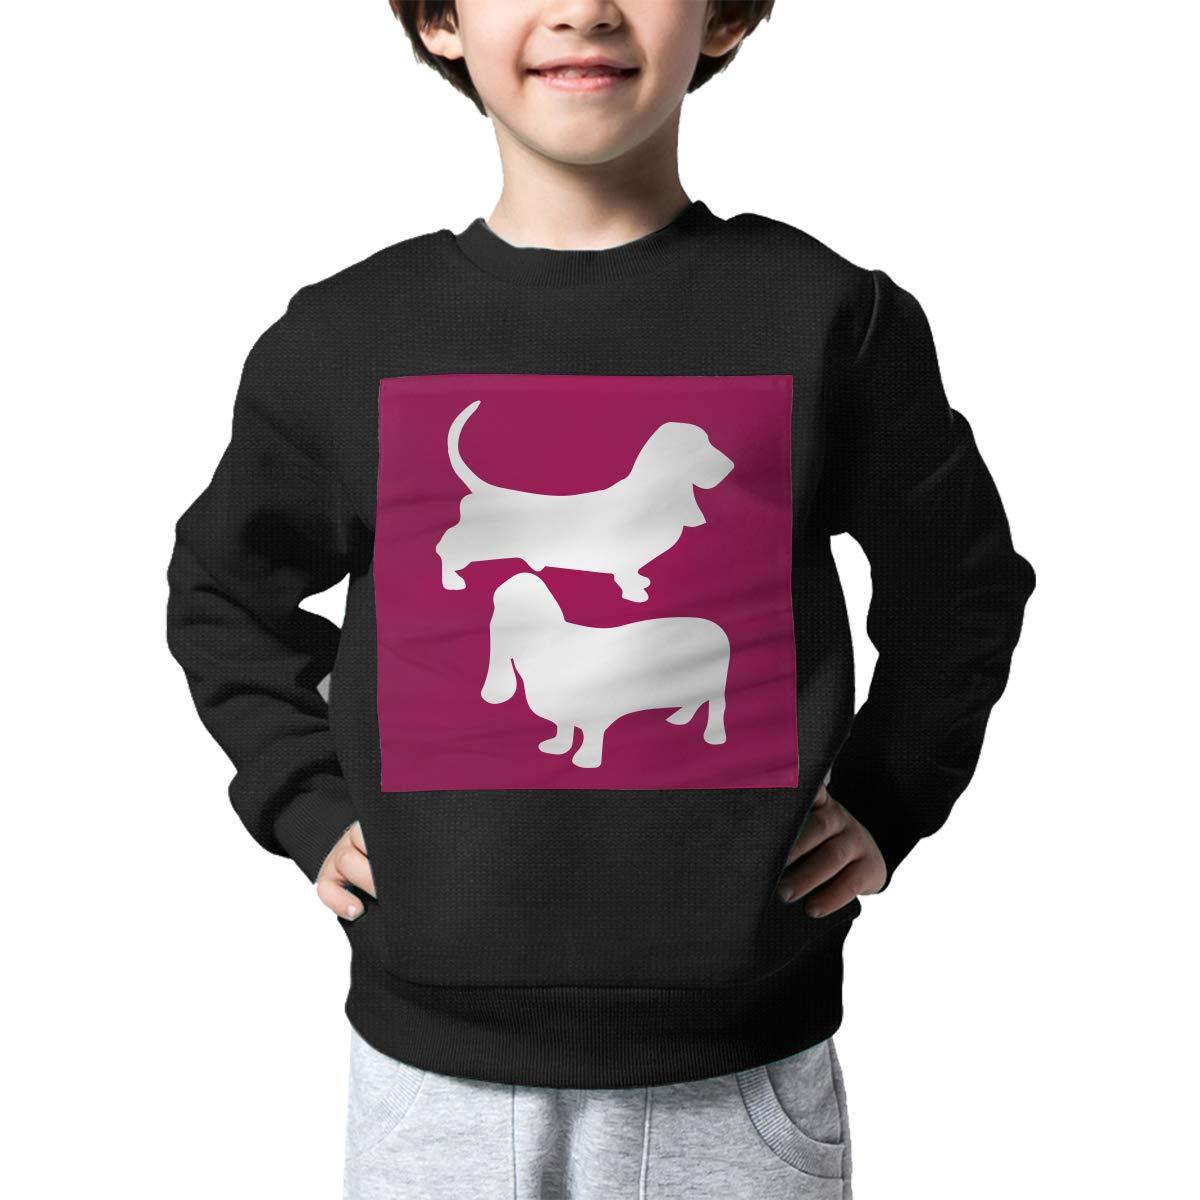 AW-KOCP Childrens Basset Hound Sweater Boys Girls Outerwear